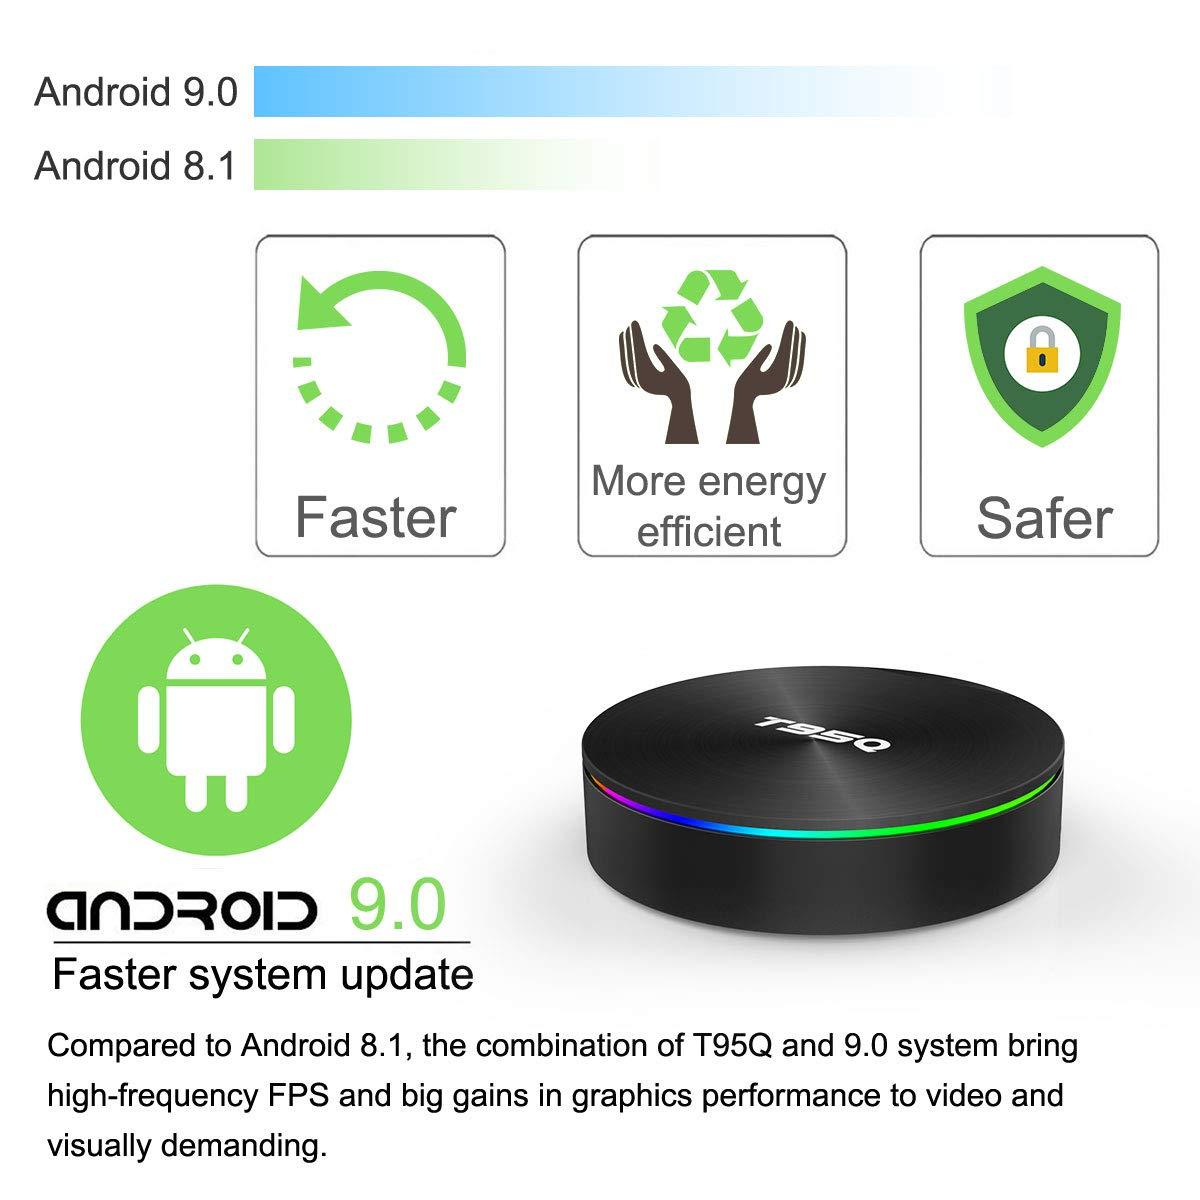 Android TV Box, YAGALA T95Q Android 9 0 TV Box 4GB RAM 32GB ROM Amlogic  S905X2 Quad-core Cortex-A53 Bluetooth 4 1 HDMI 2 1 4K Resolution H 265